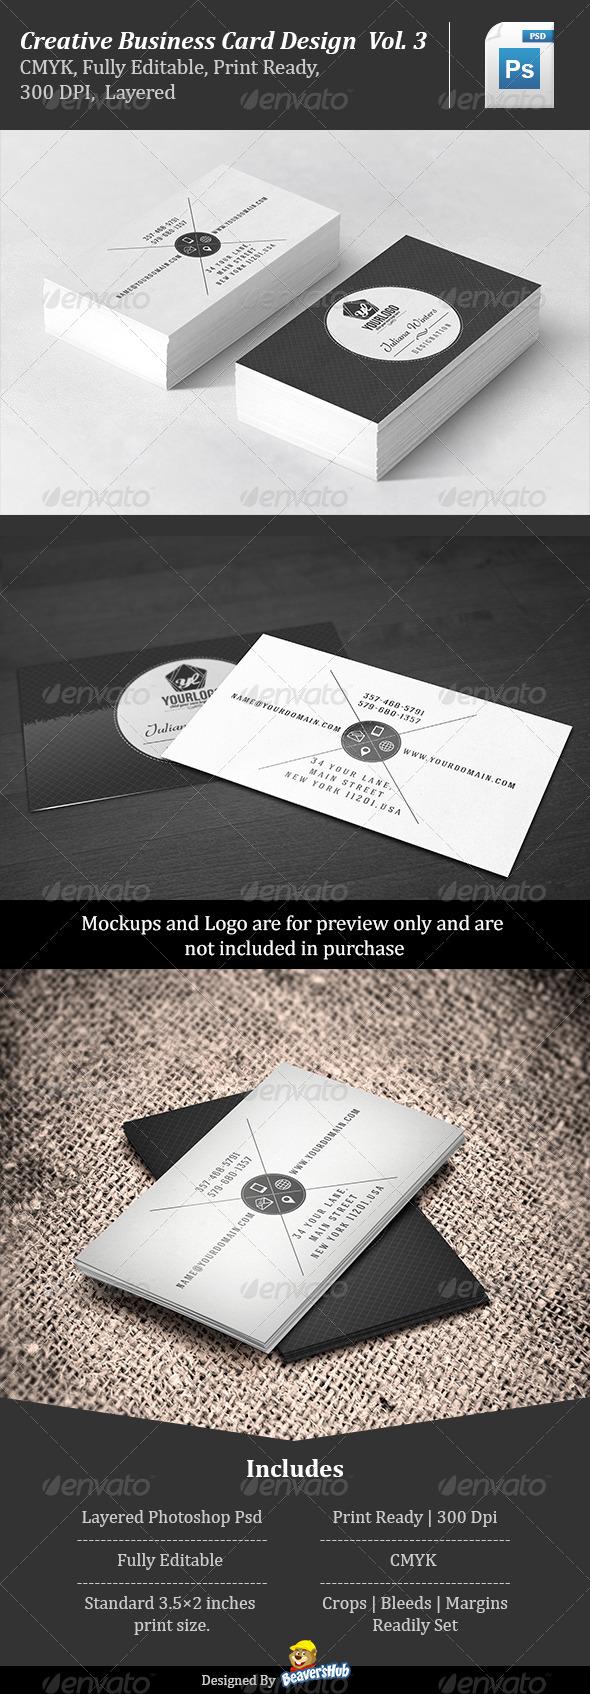 GraphicRiver Creative Business Card Design Vol.3 7041128